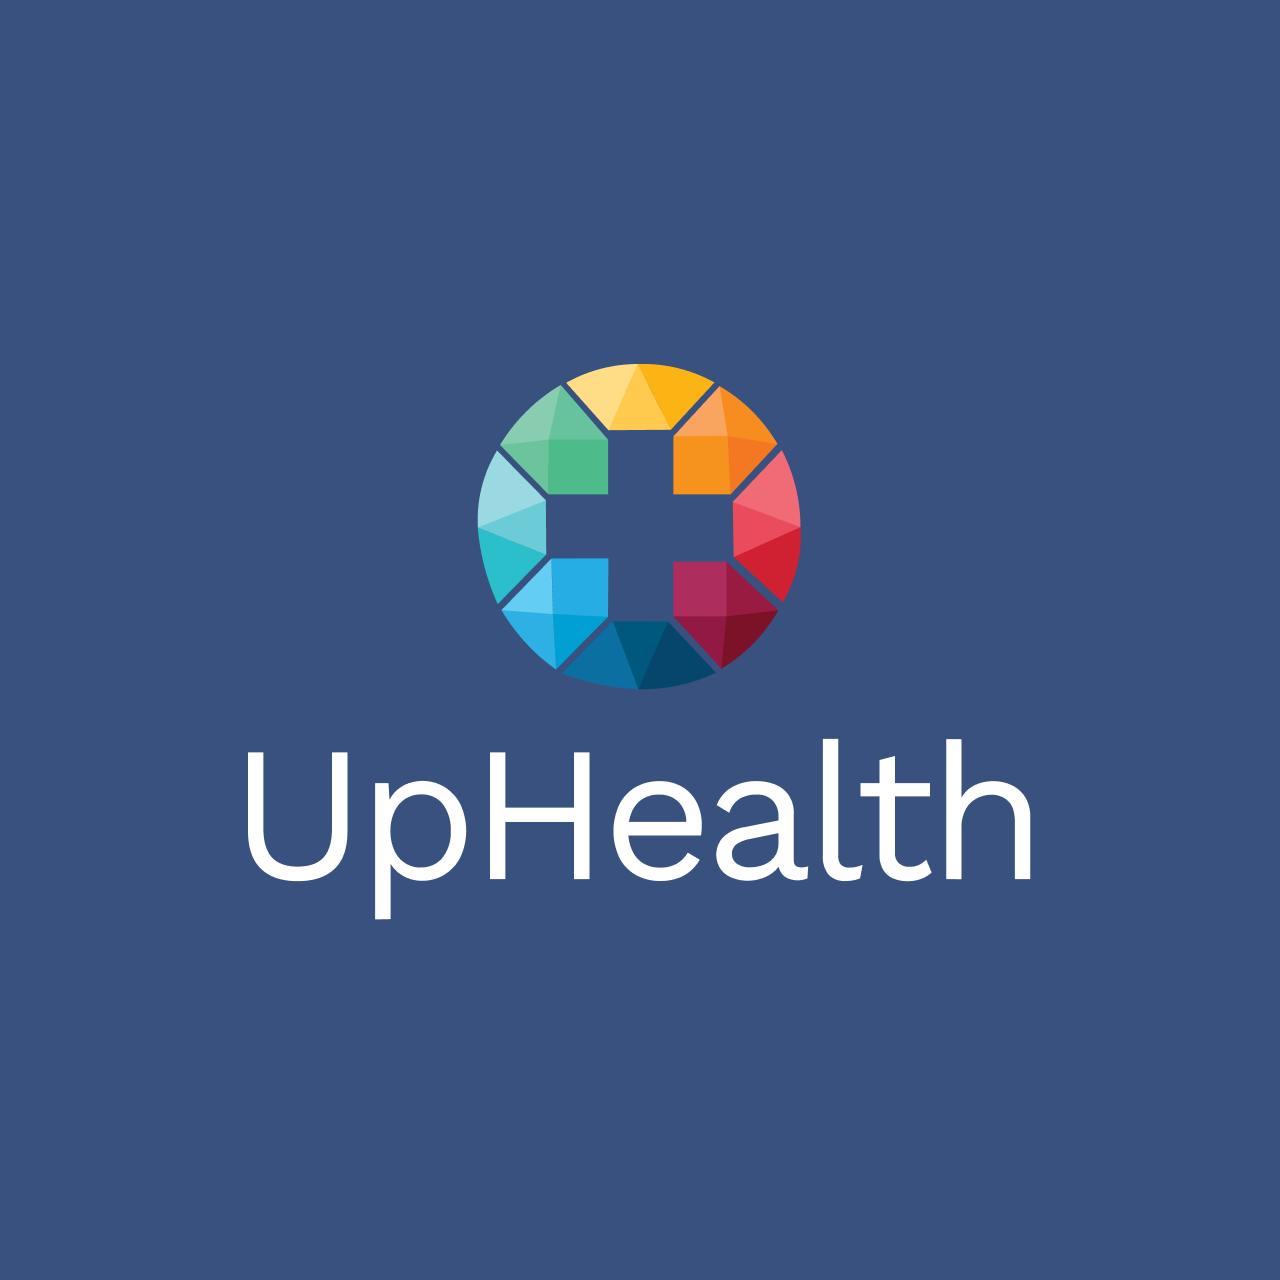 uphealth logo